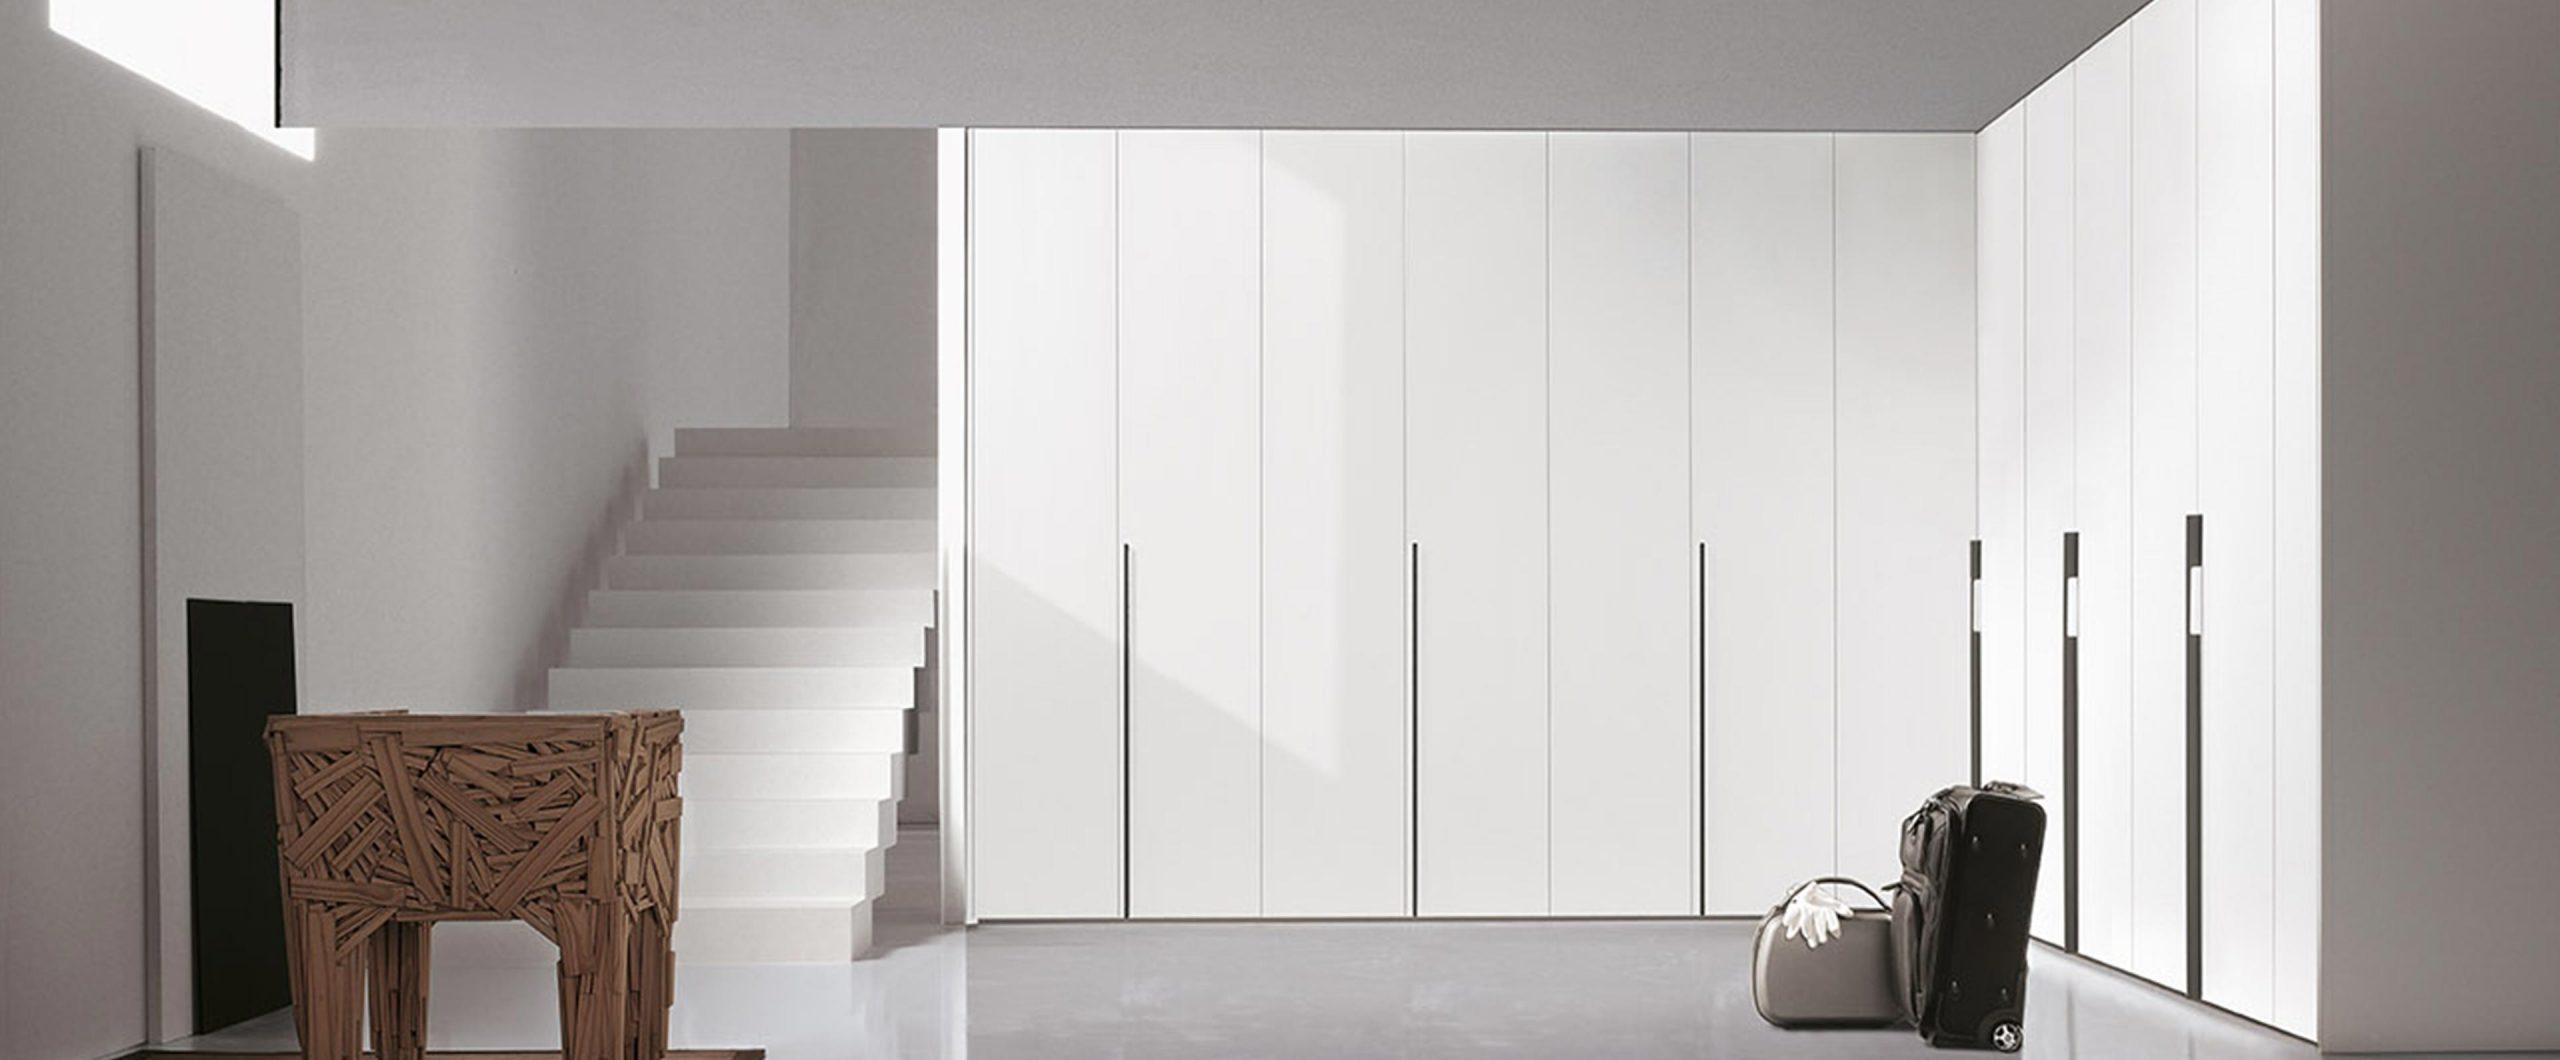 шкаф в стиле минимализм